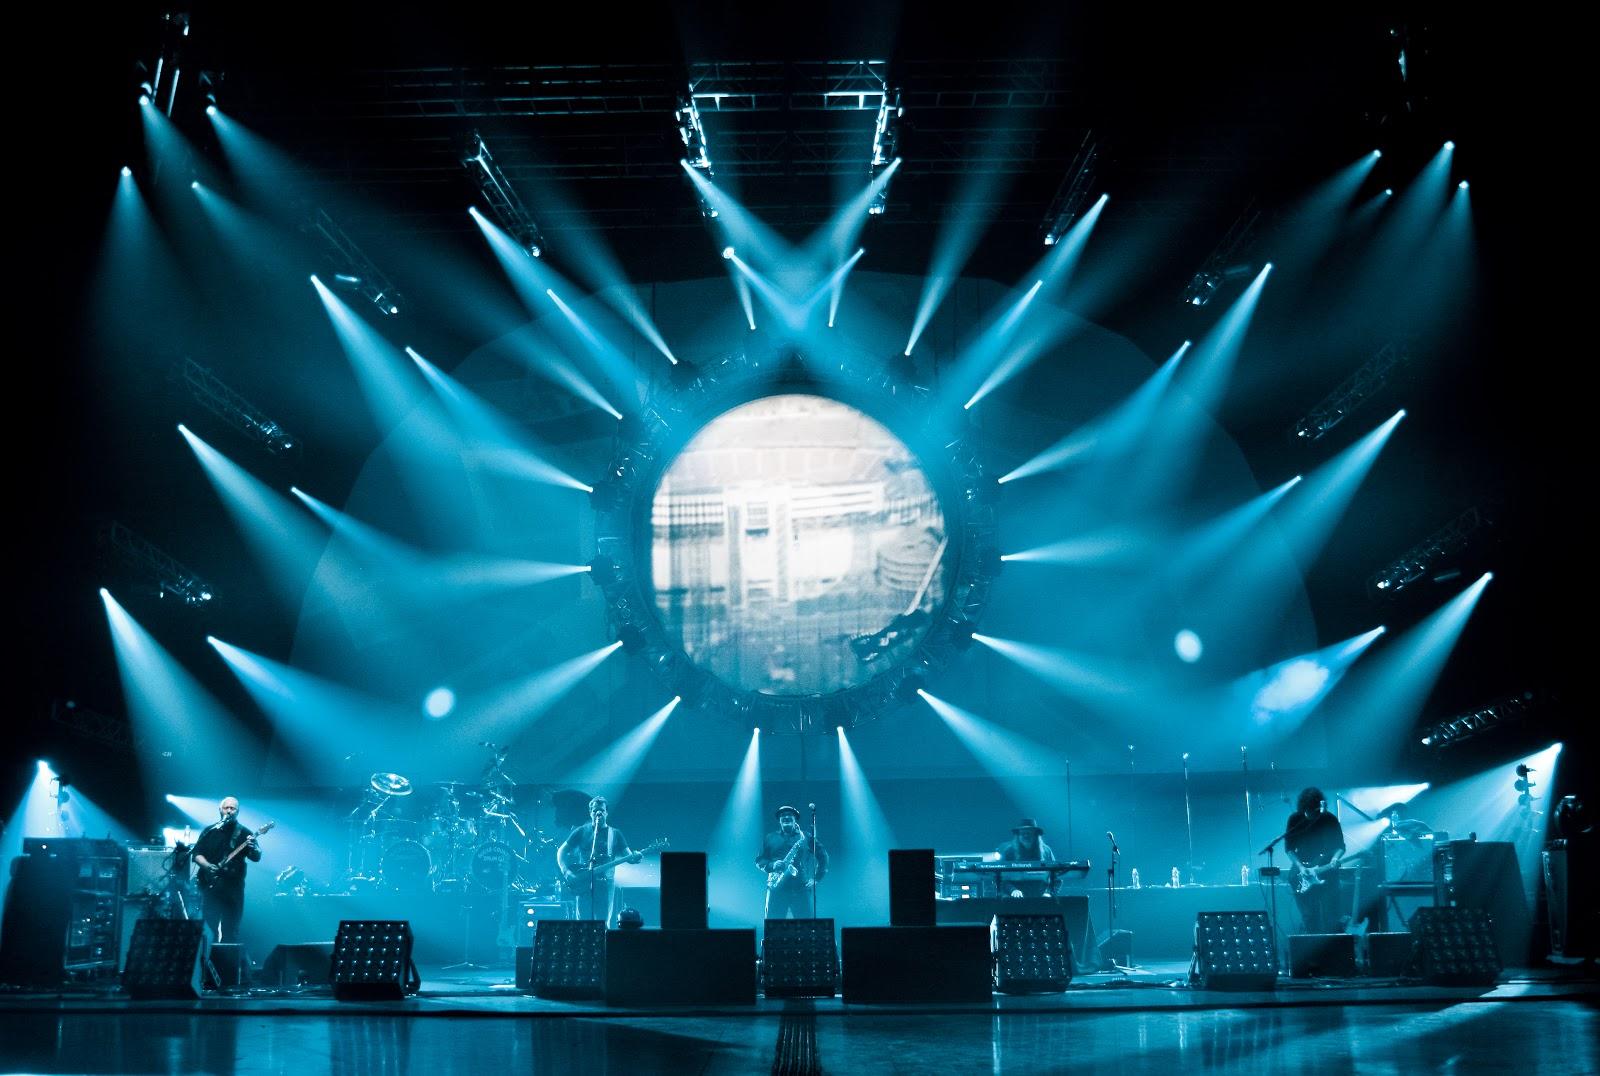 staging toolbar rock concert stage